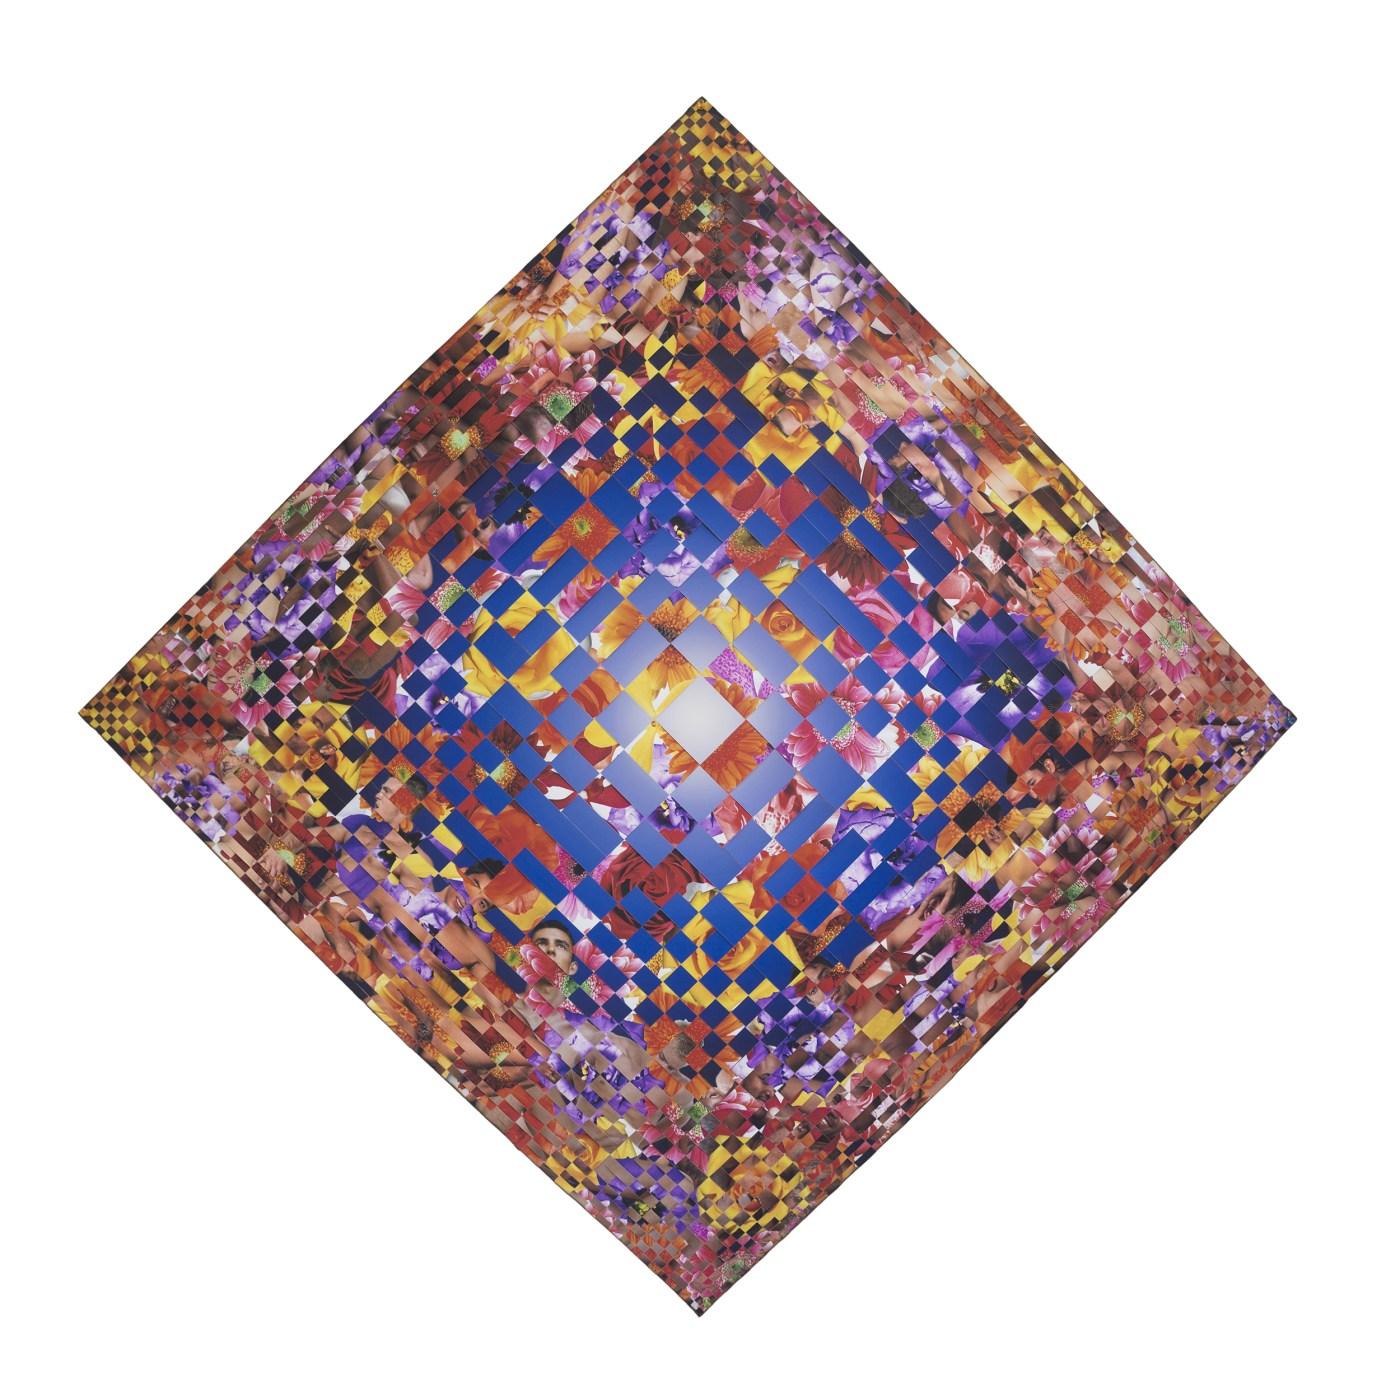 3. 黎光頂 Dinh Q. Lê, 'Untitled 3, Earthly Delights Series', 2018, , 107 x 107cm